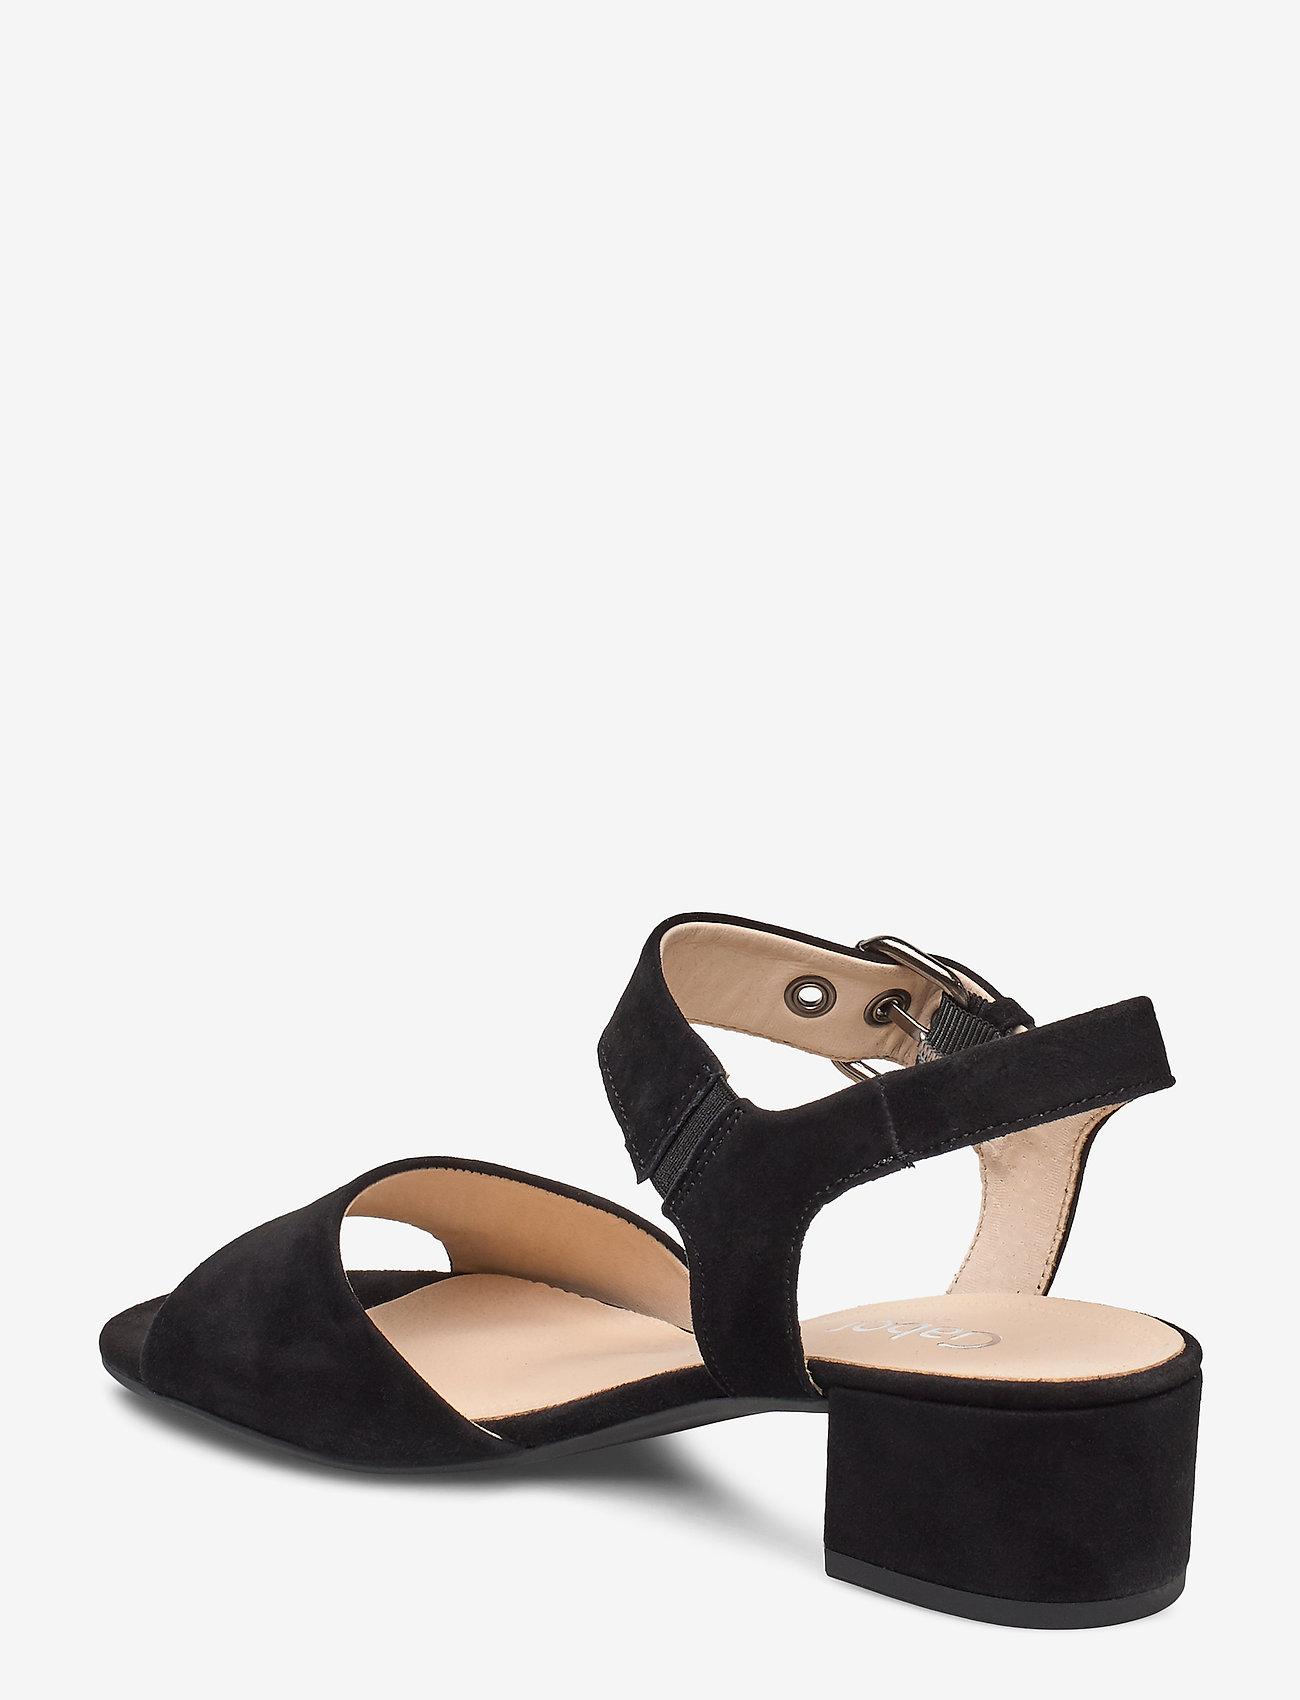 Gabor sandals - Absatzschuhe BLACK - Schuhe Billige